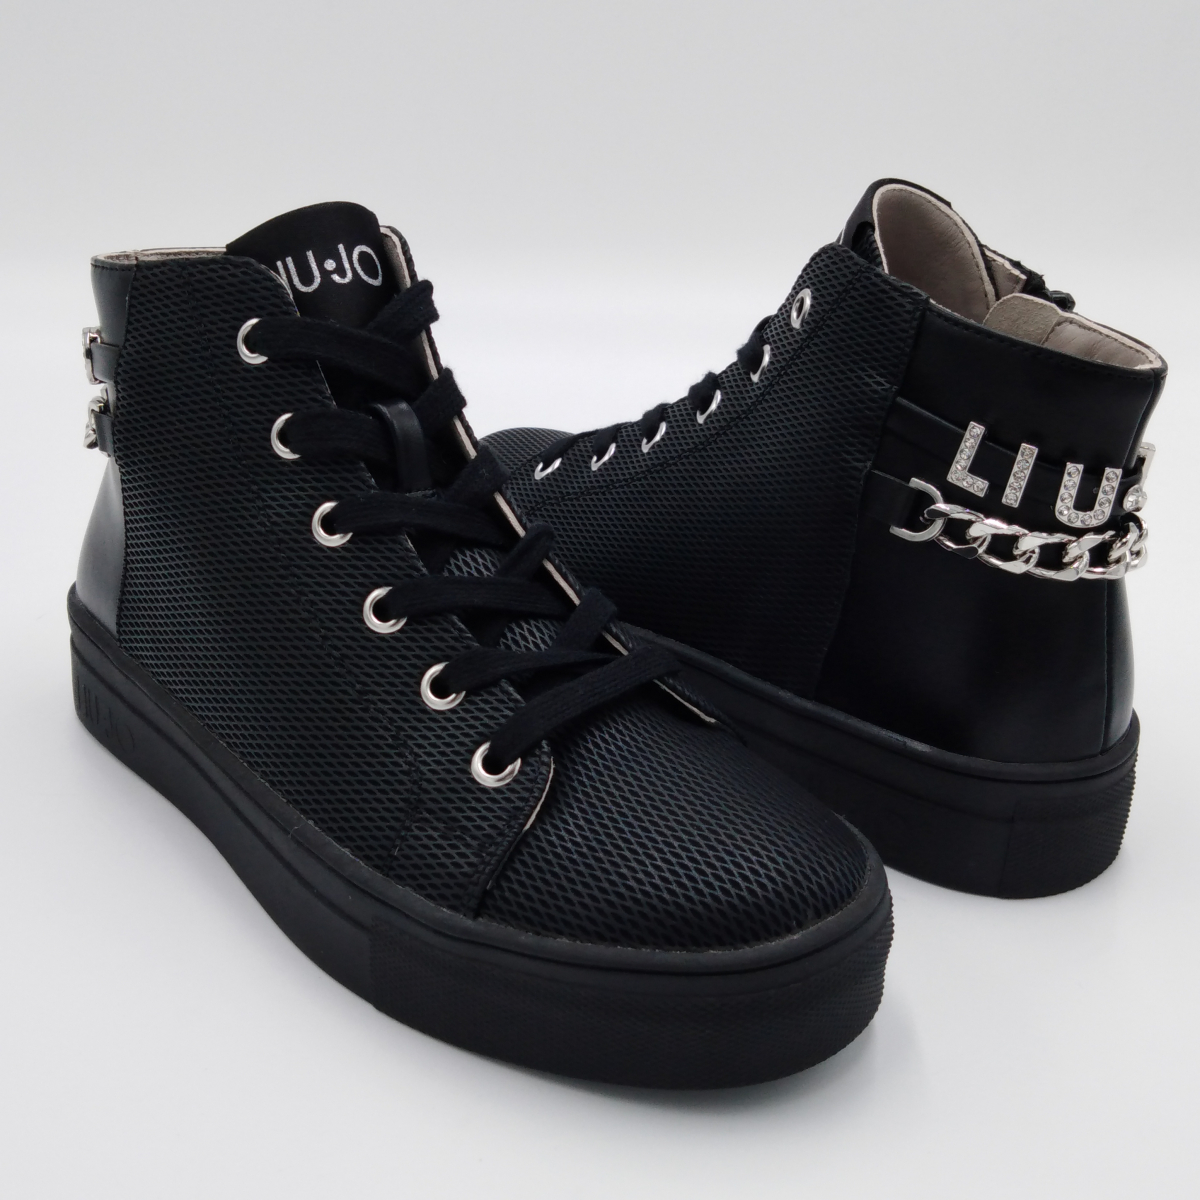 Liu Jo Alicia 127 -Sneaker...